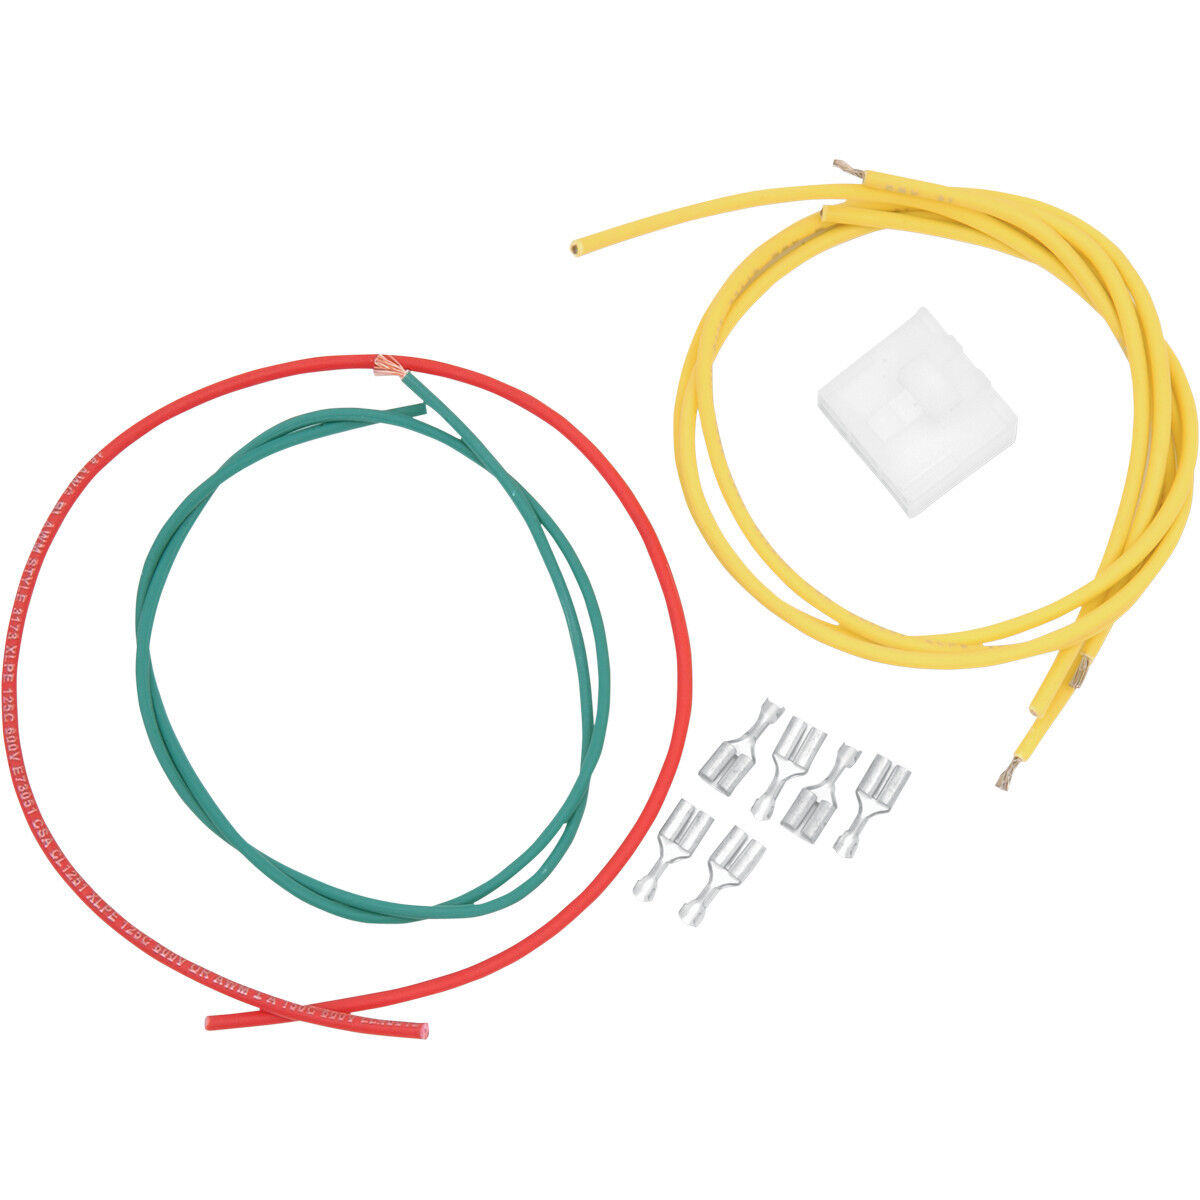 Yamaha R Wiring Harness EBay - 02 yamaha r1 headlight wiring diagram